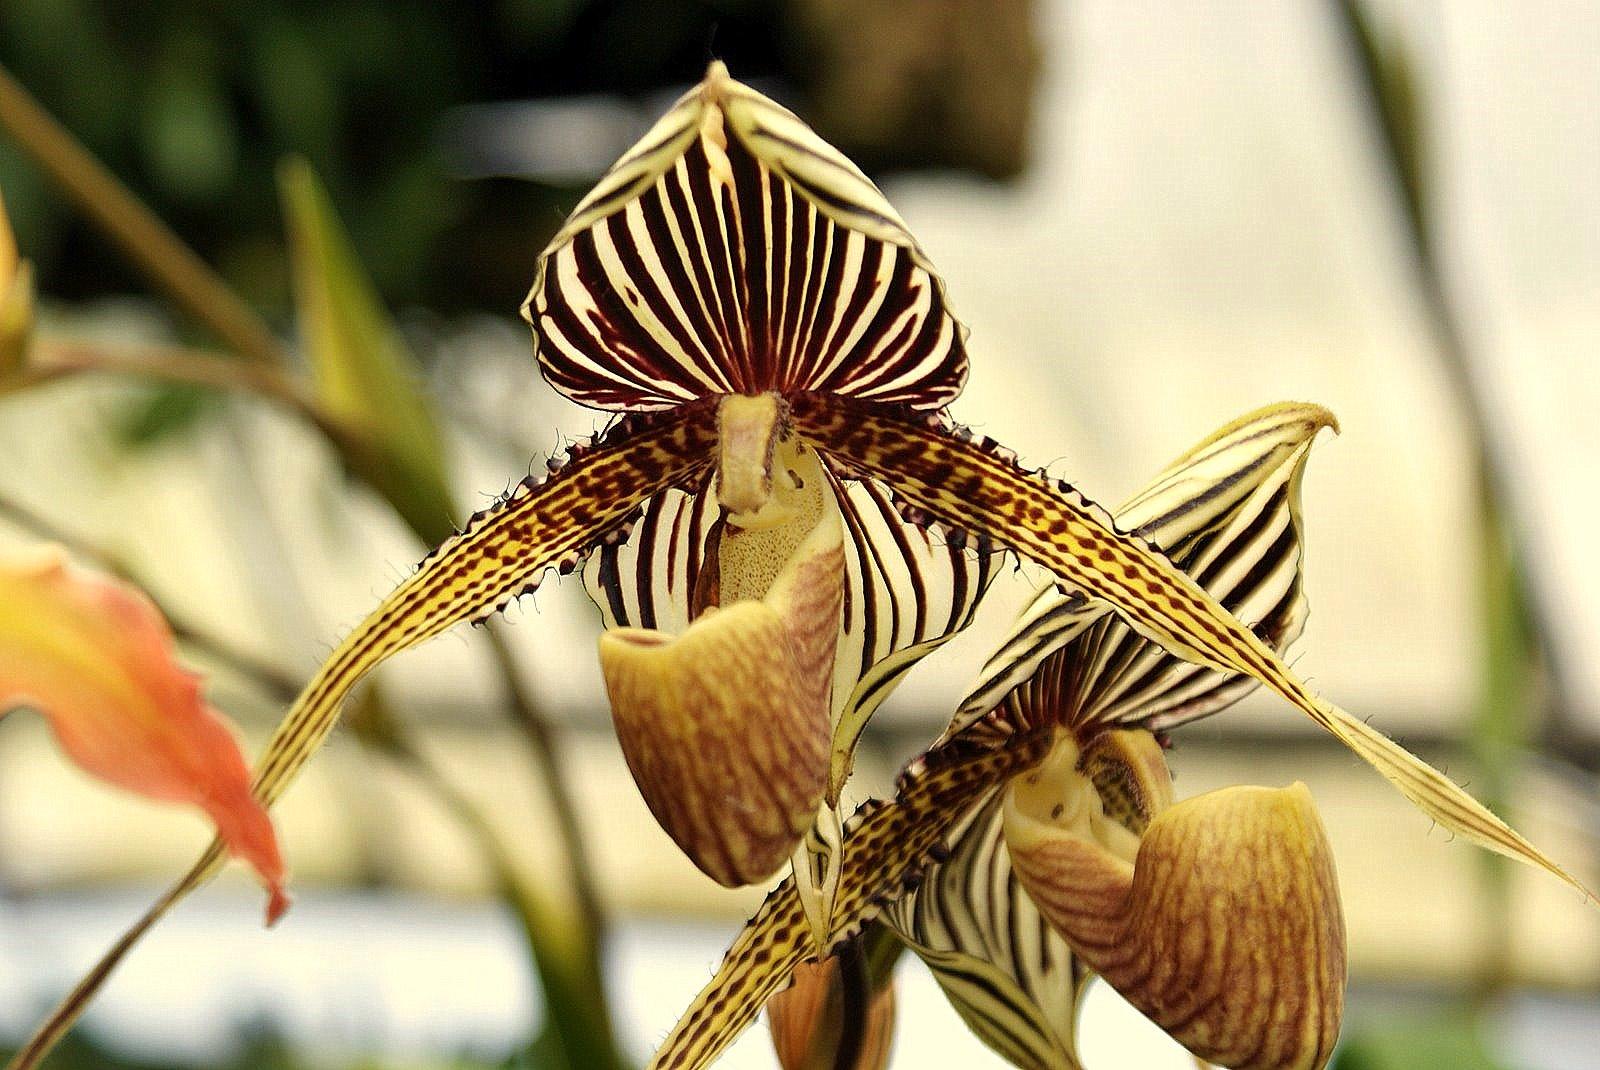 ORCHIDEE SABOT DE VENUS